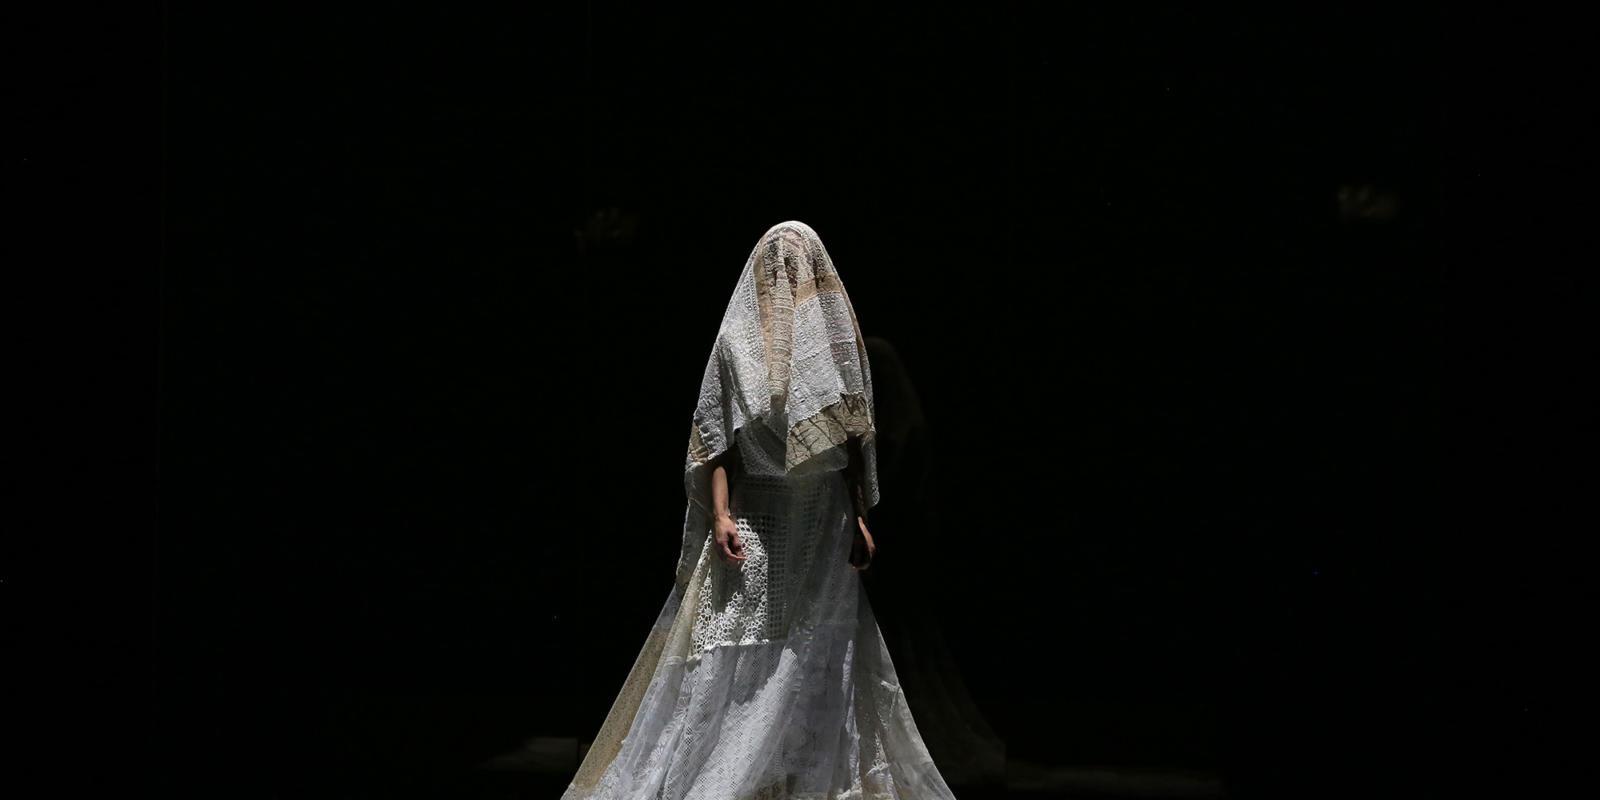 Sarah Tynan on stage in a wedding dress